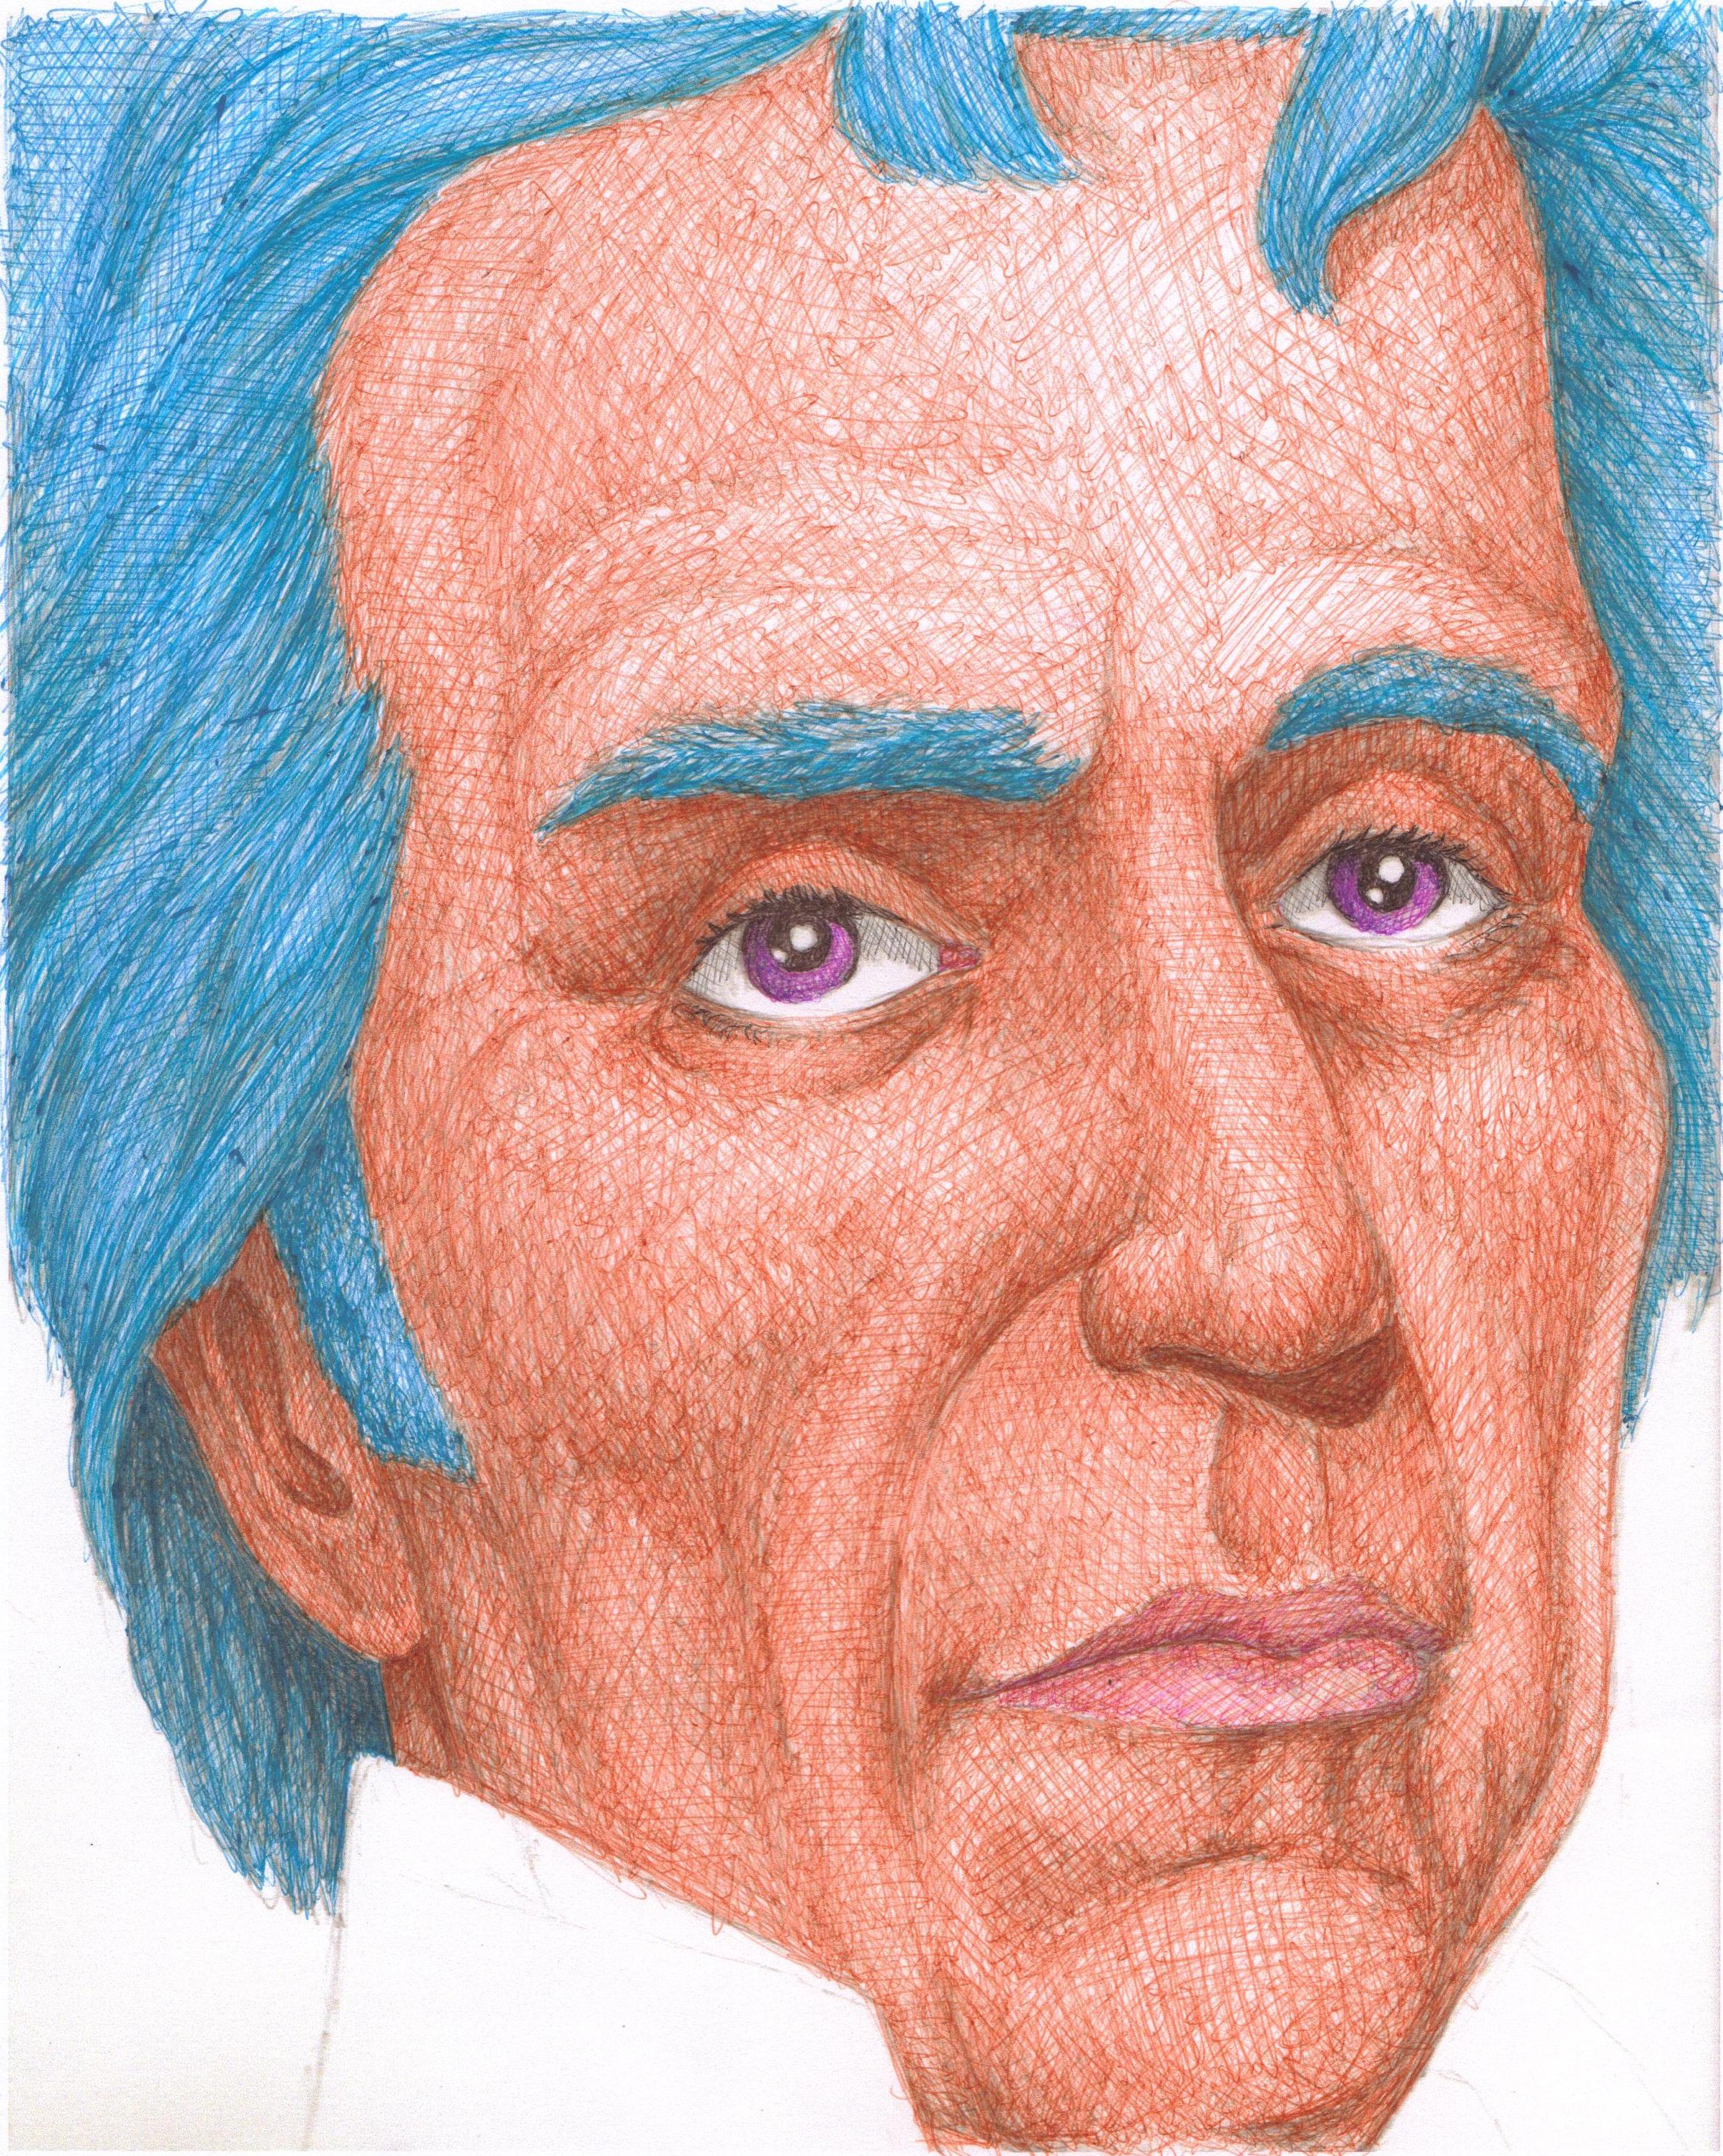 Study of Andrew Jackson   2010  Ballpoint Pen on Paper  7x9